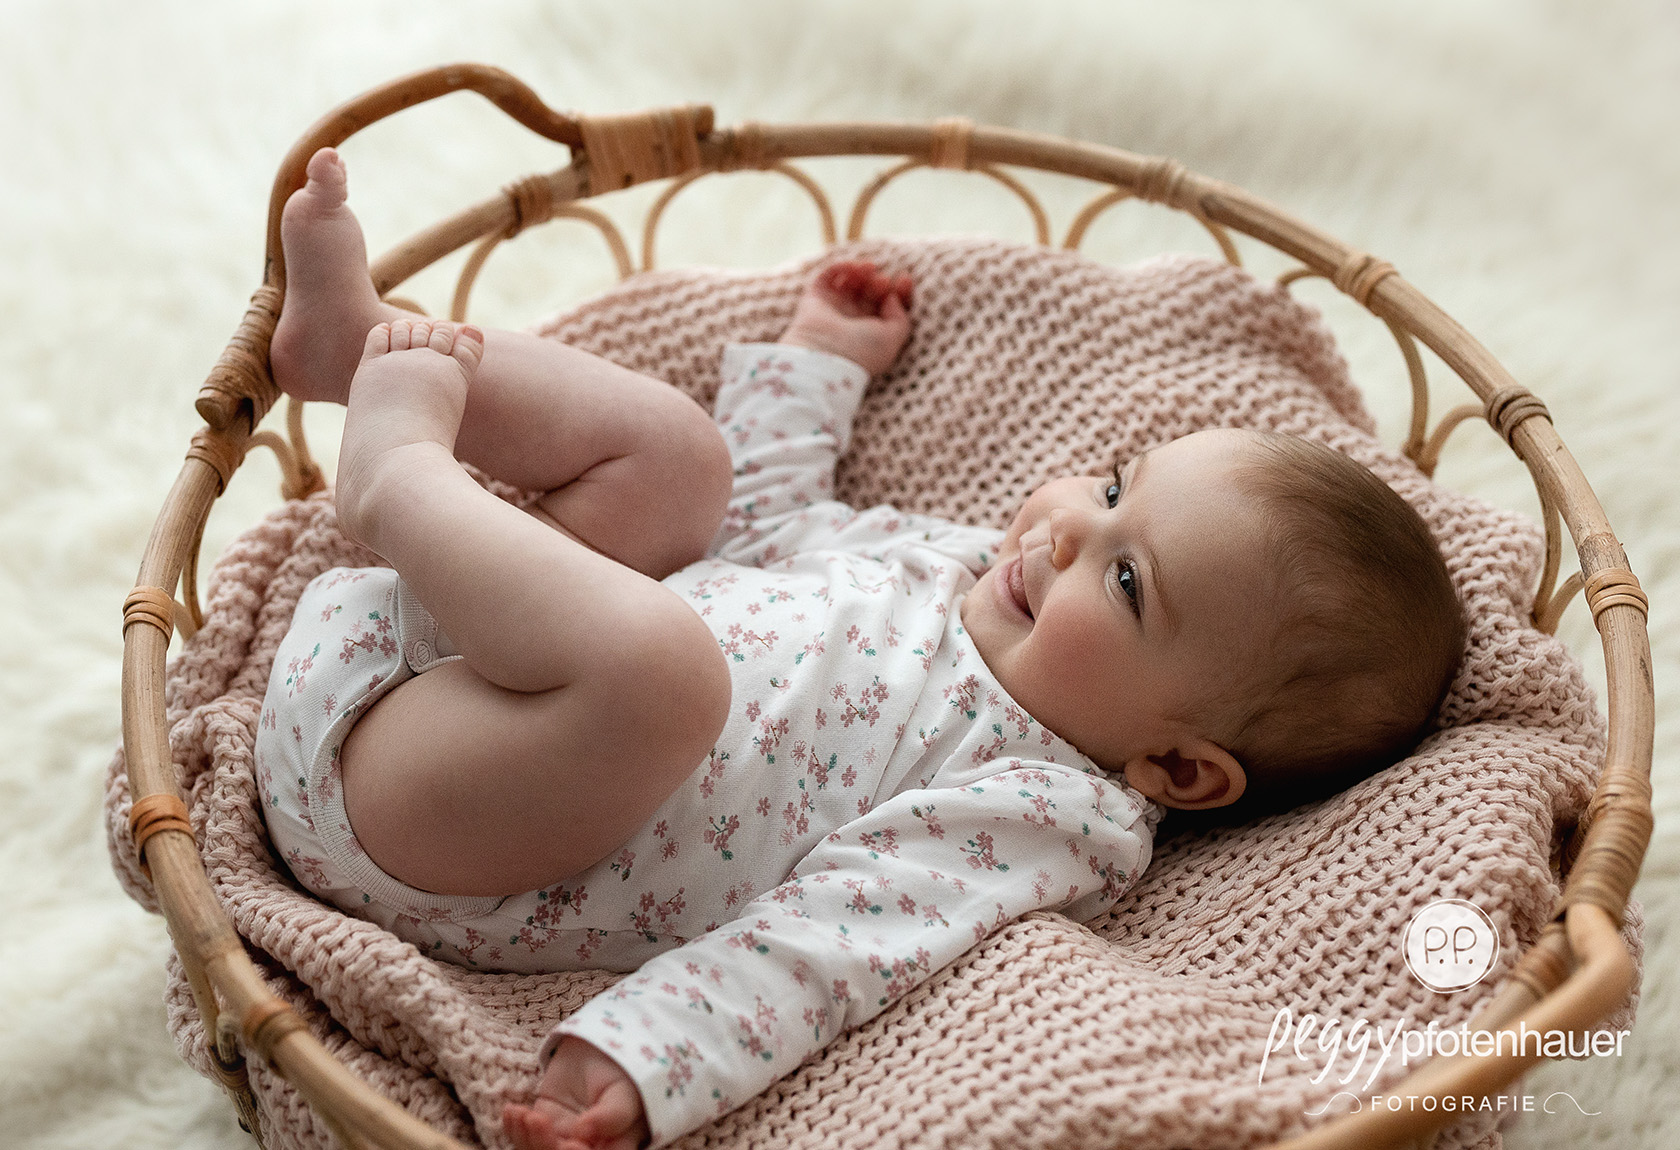 zarte Babybilder